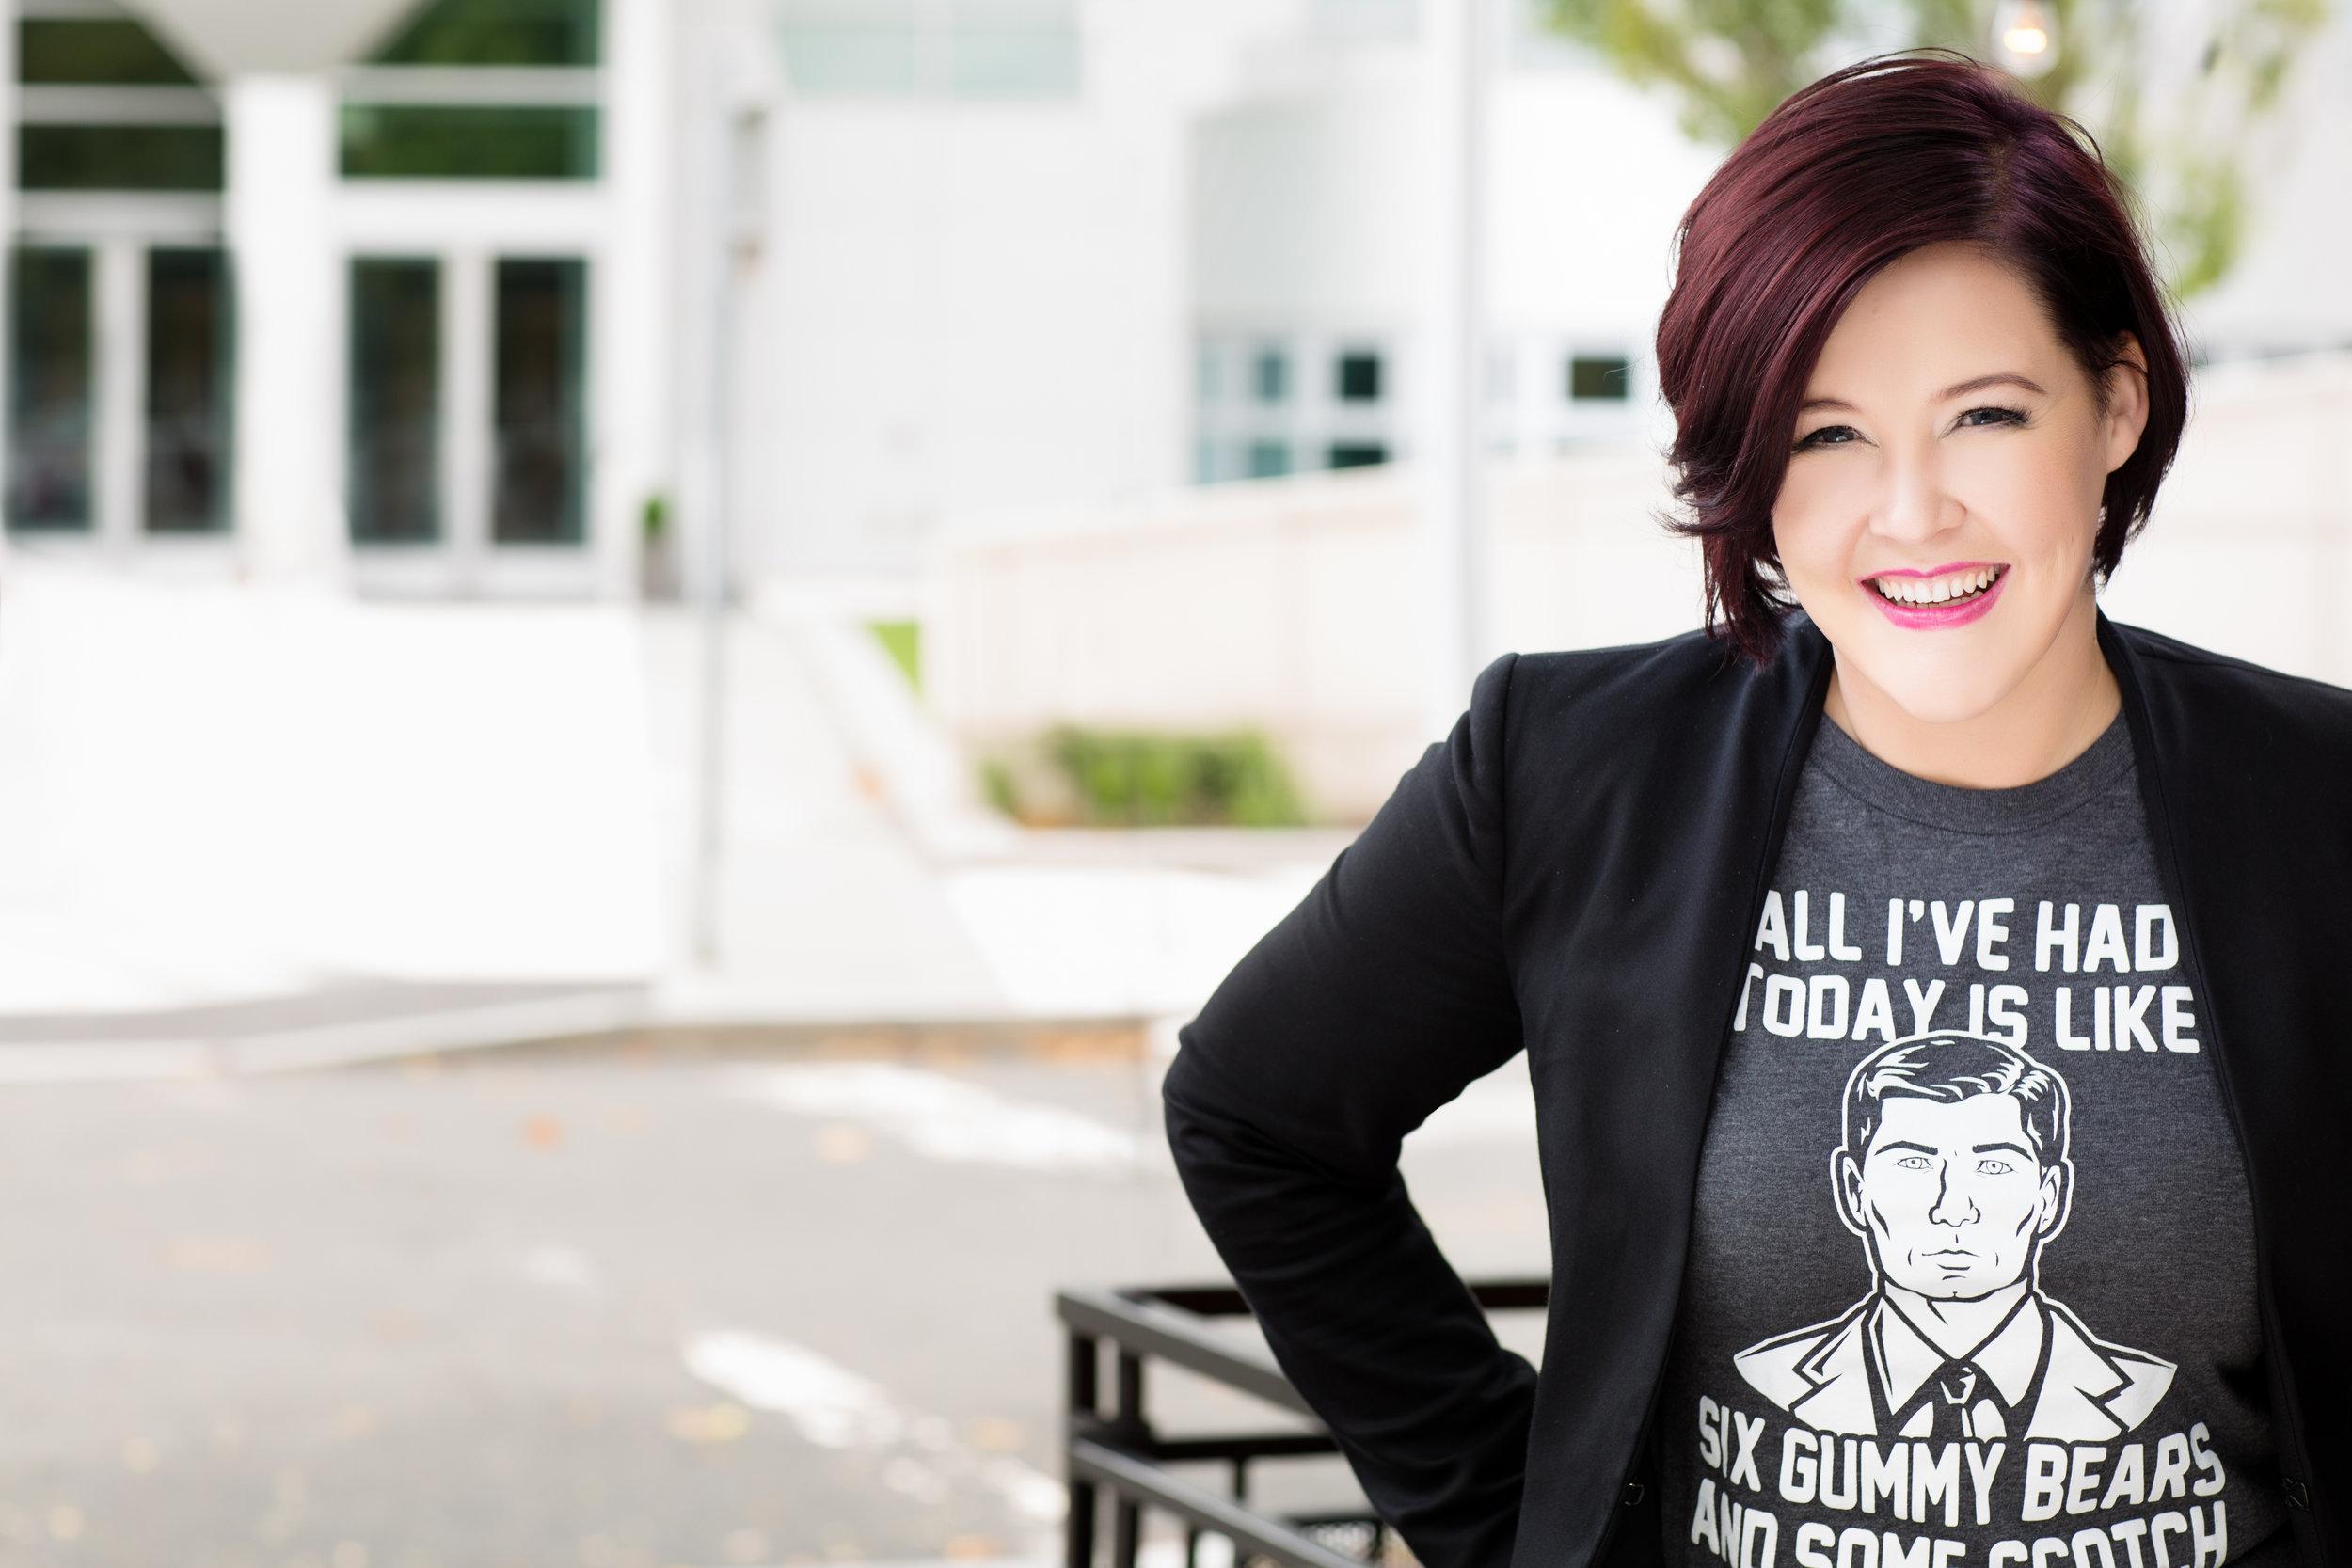 Ali Craig - Branding Expert and Entrepreneur